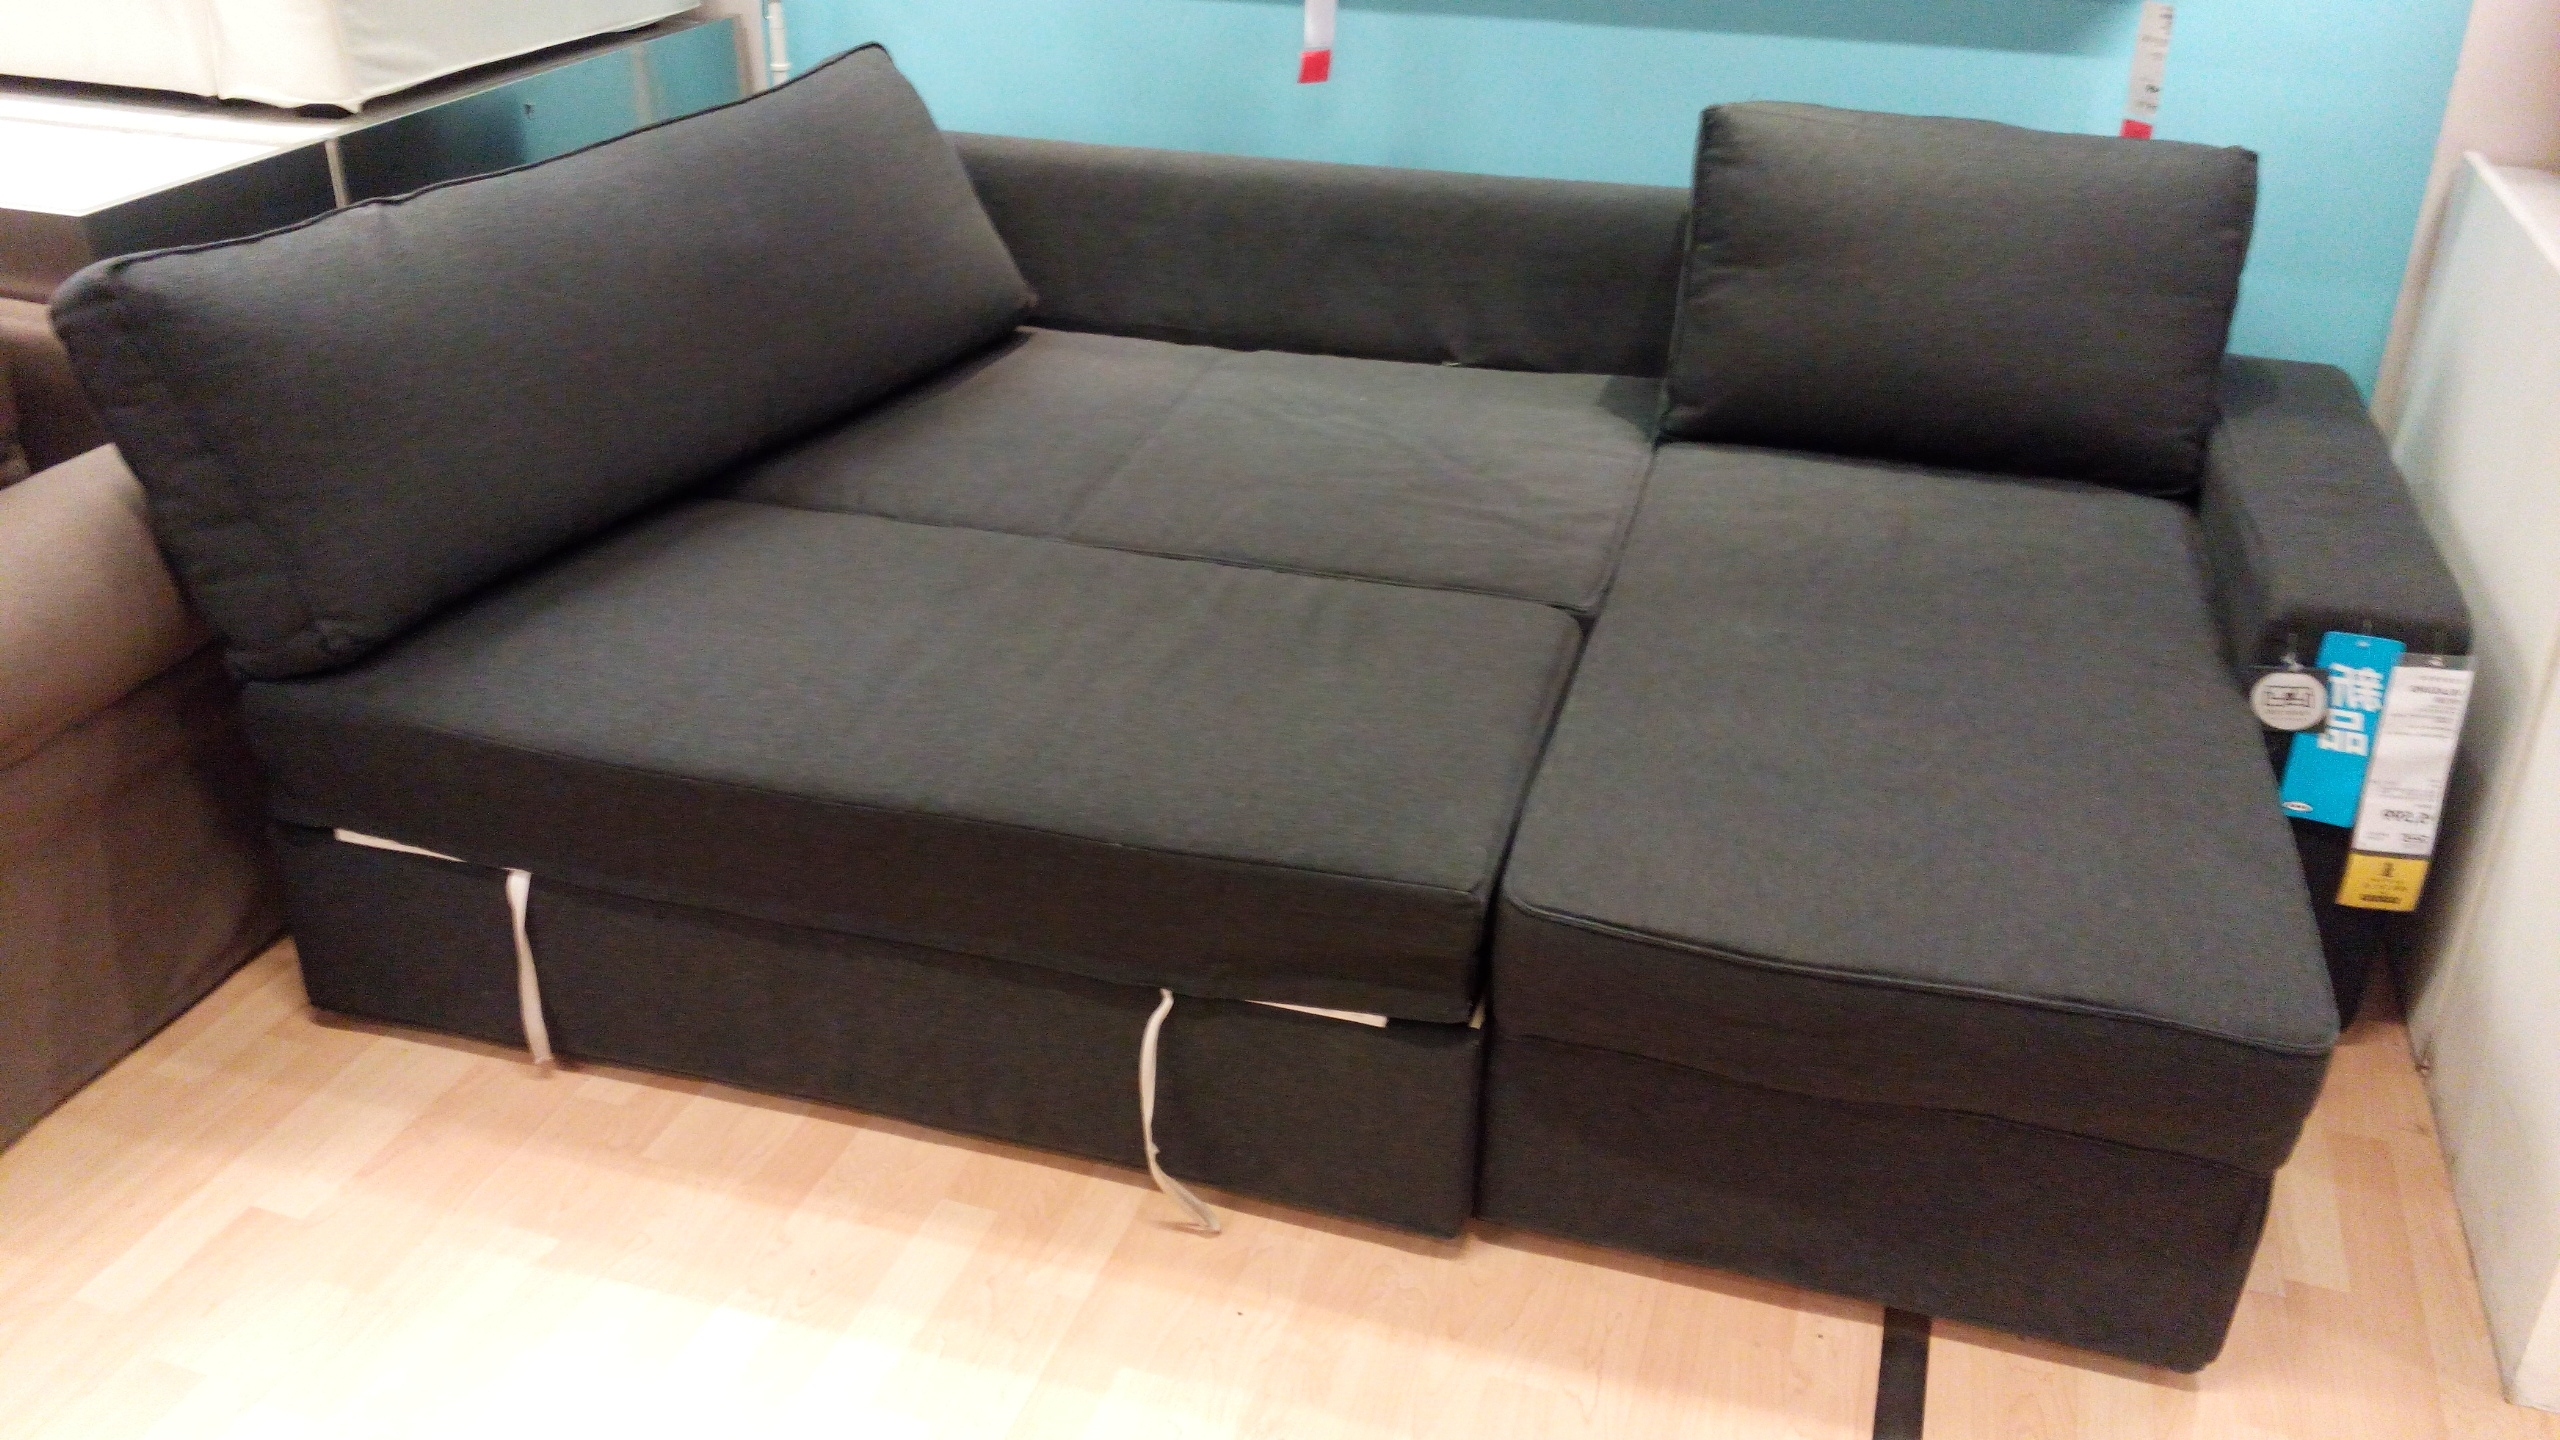 Chaise Lounge Sleeper Sofa (View 3 of 15)